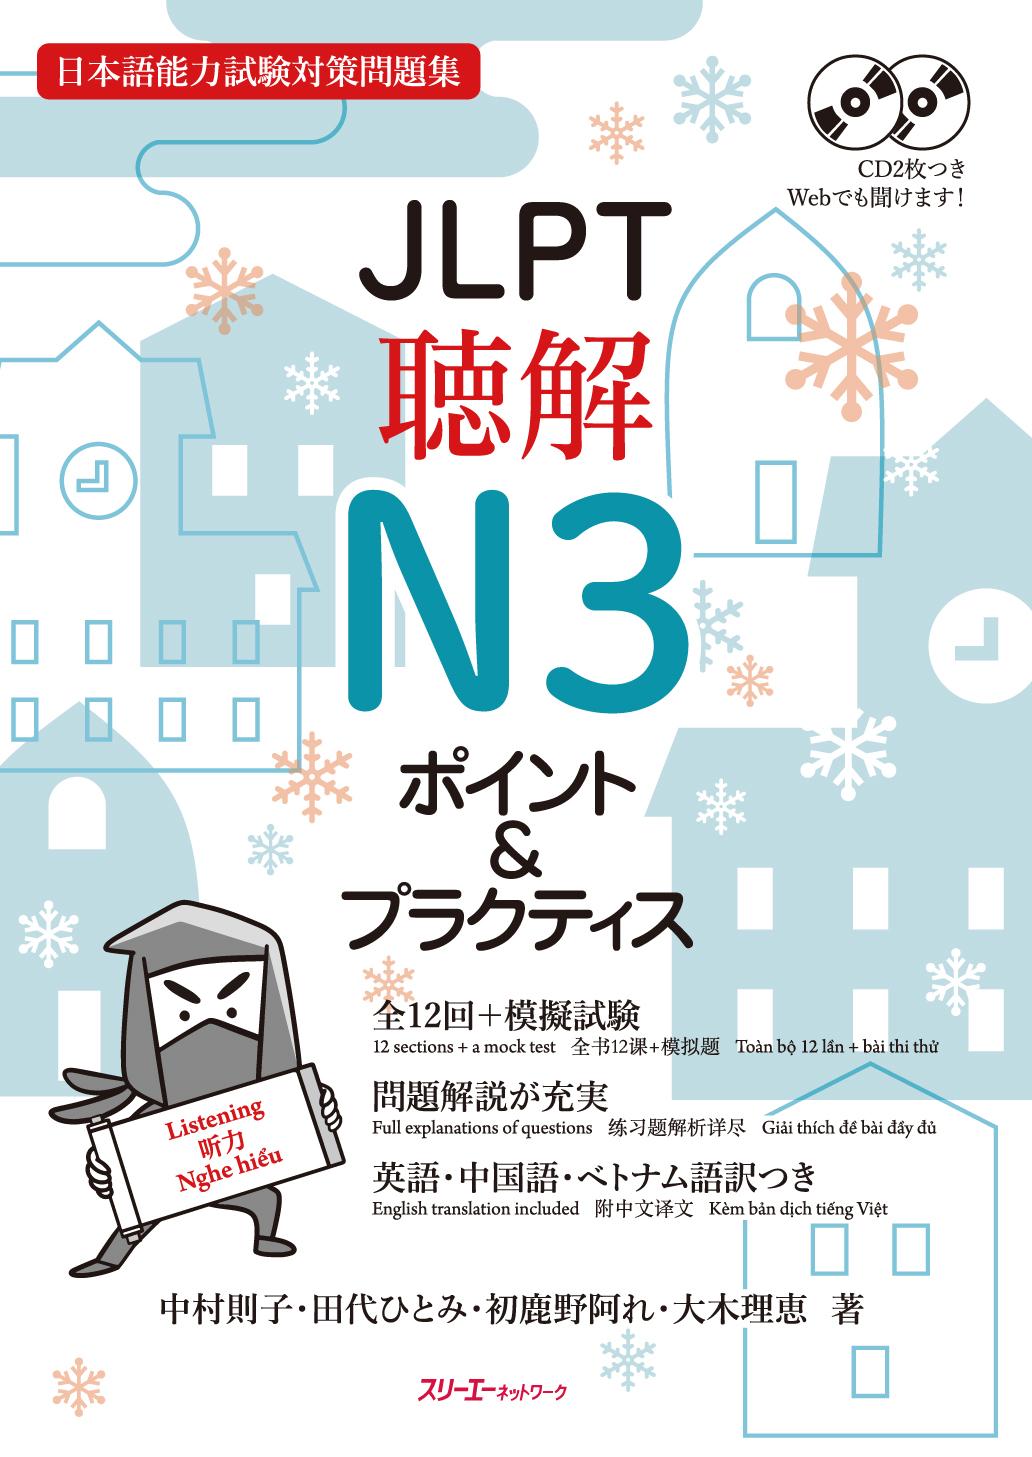 JLPT聴解N3 ポイント&プラクティス 画像